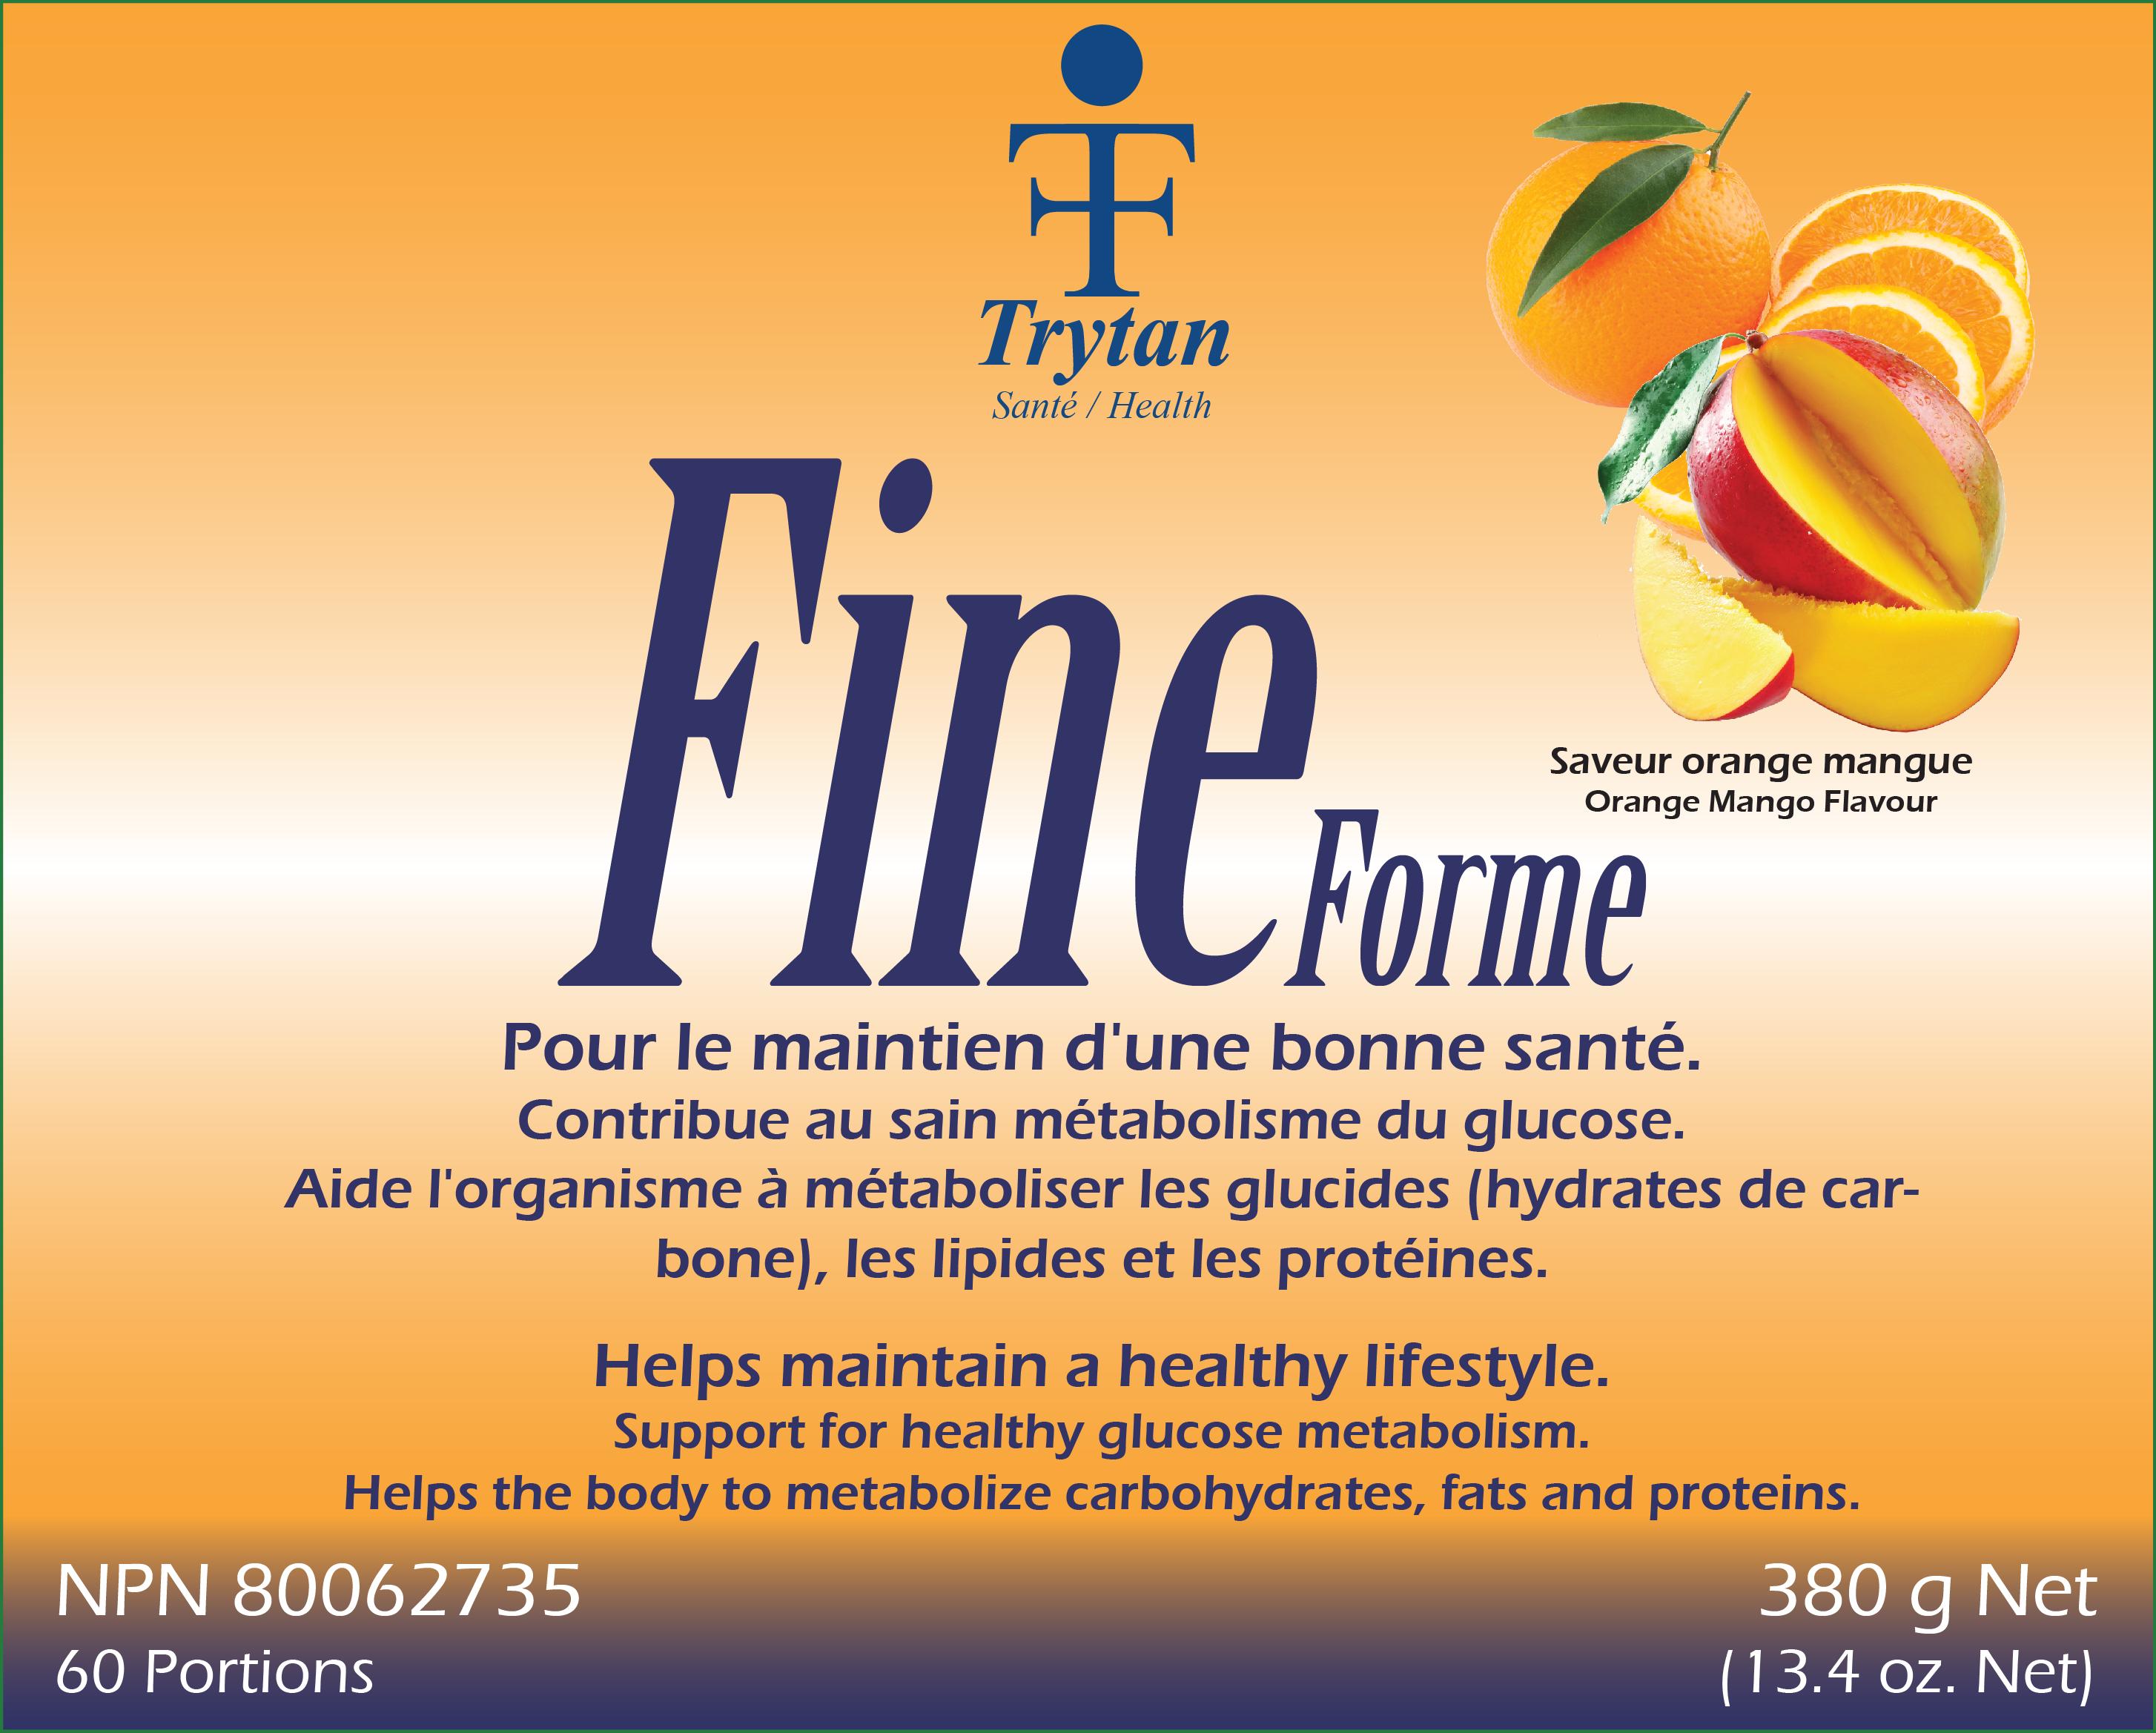 FineForme